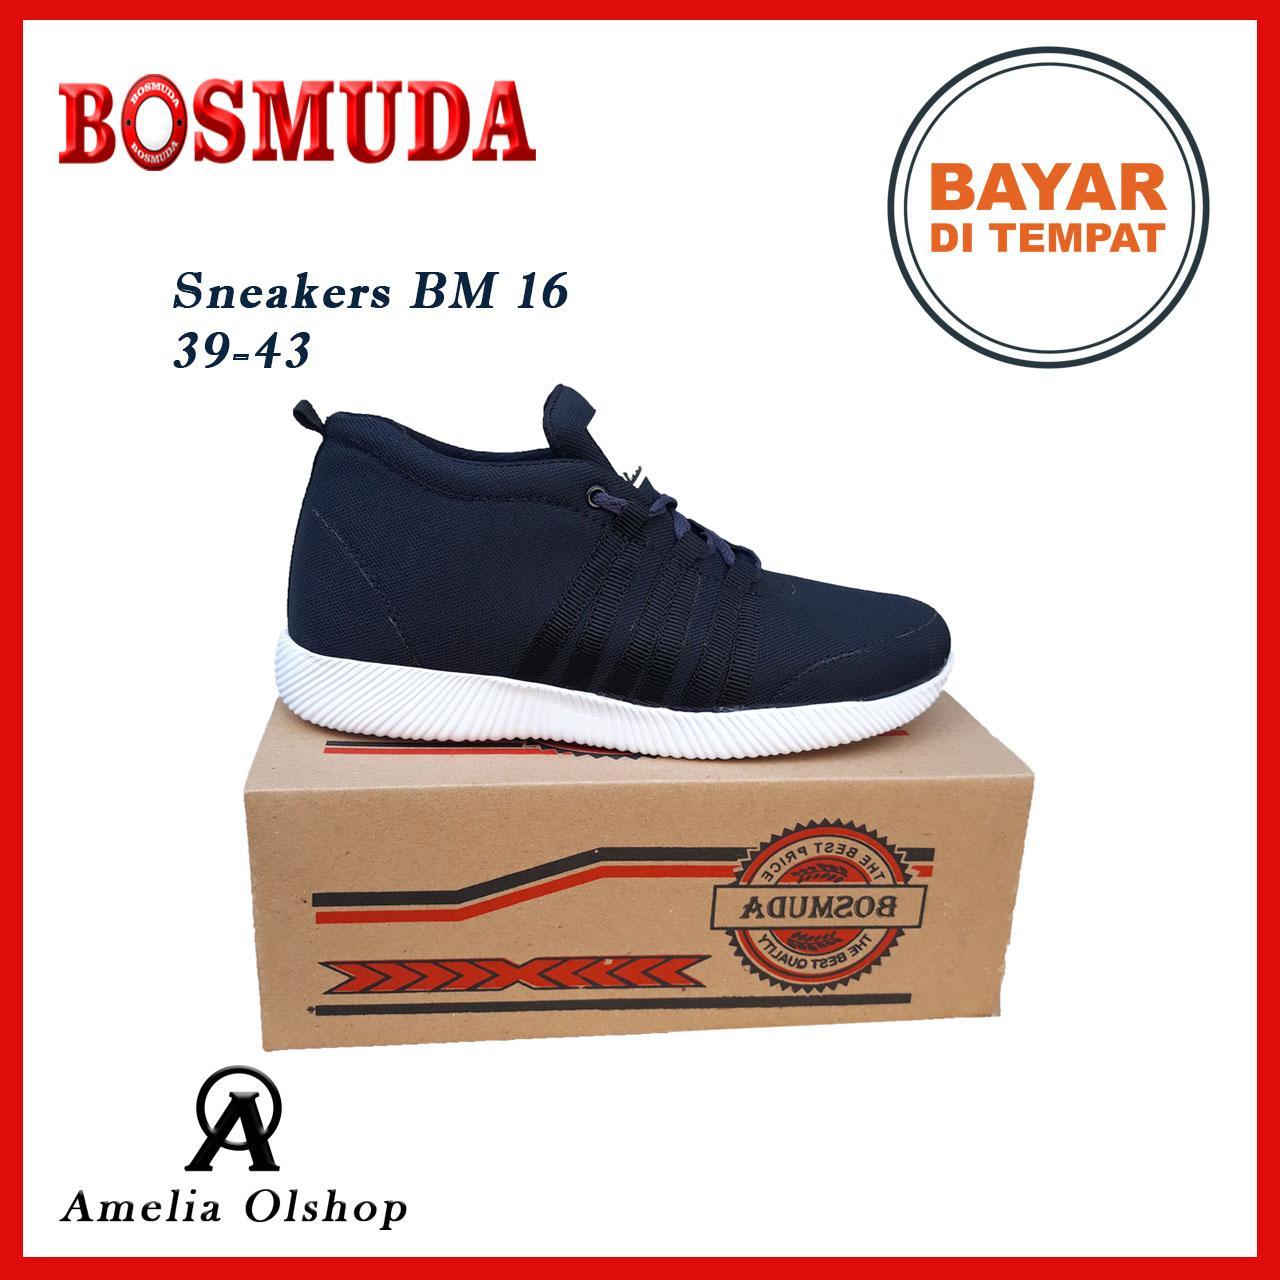 Amelia Olshop - Sepatu Sneakers BM 16 39-43 / Sepatu BOSMUDA / Sepatu Pria